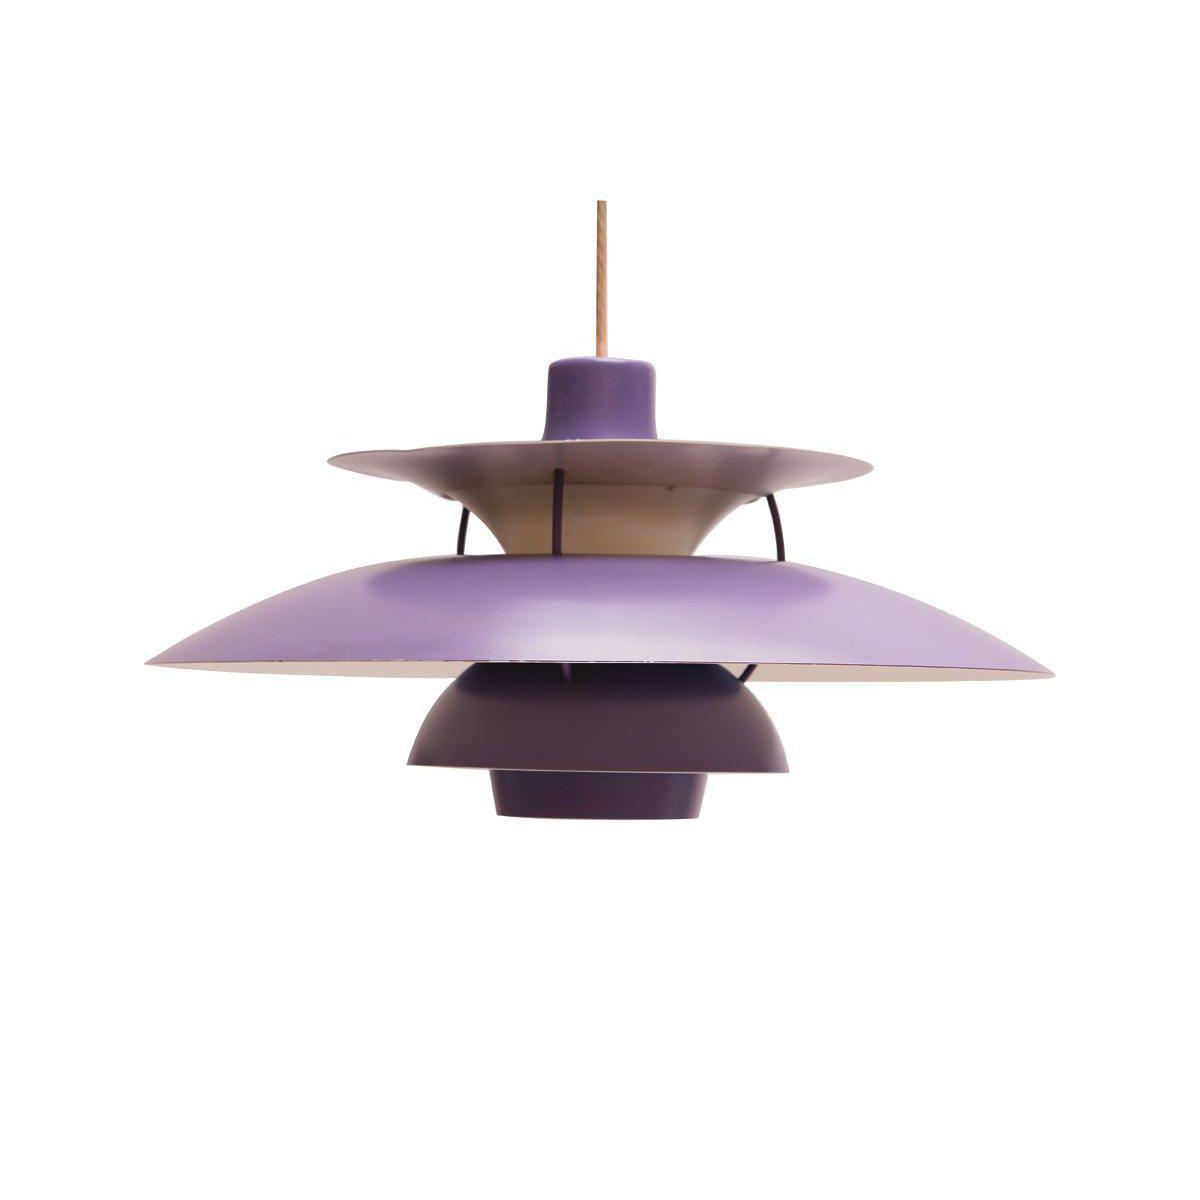 lilac-ph5-hanging-lamp-by-poul-henningsen-for-louis-poulsen-1958-9686